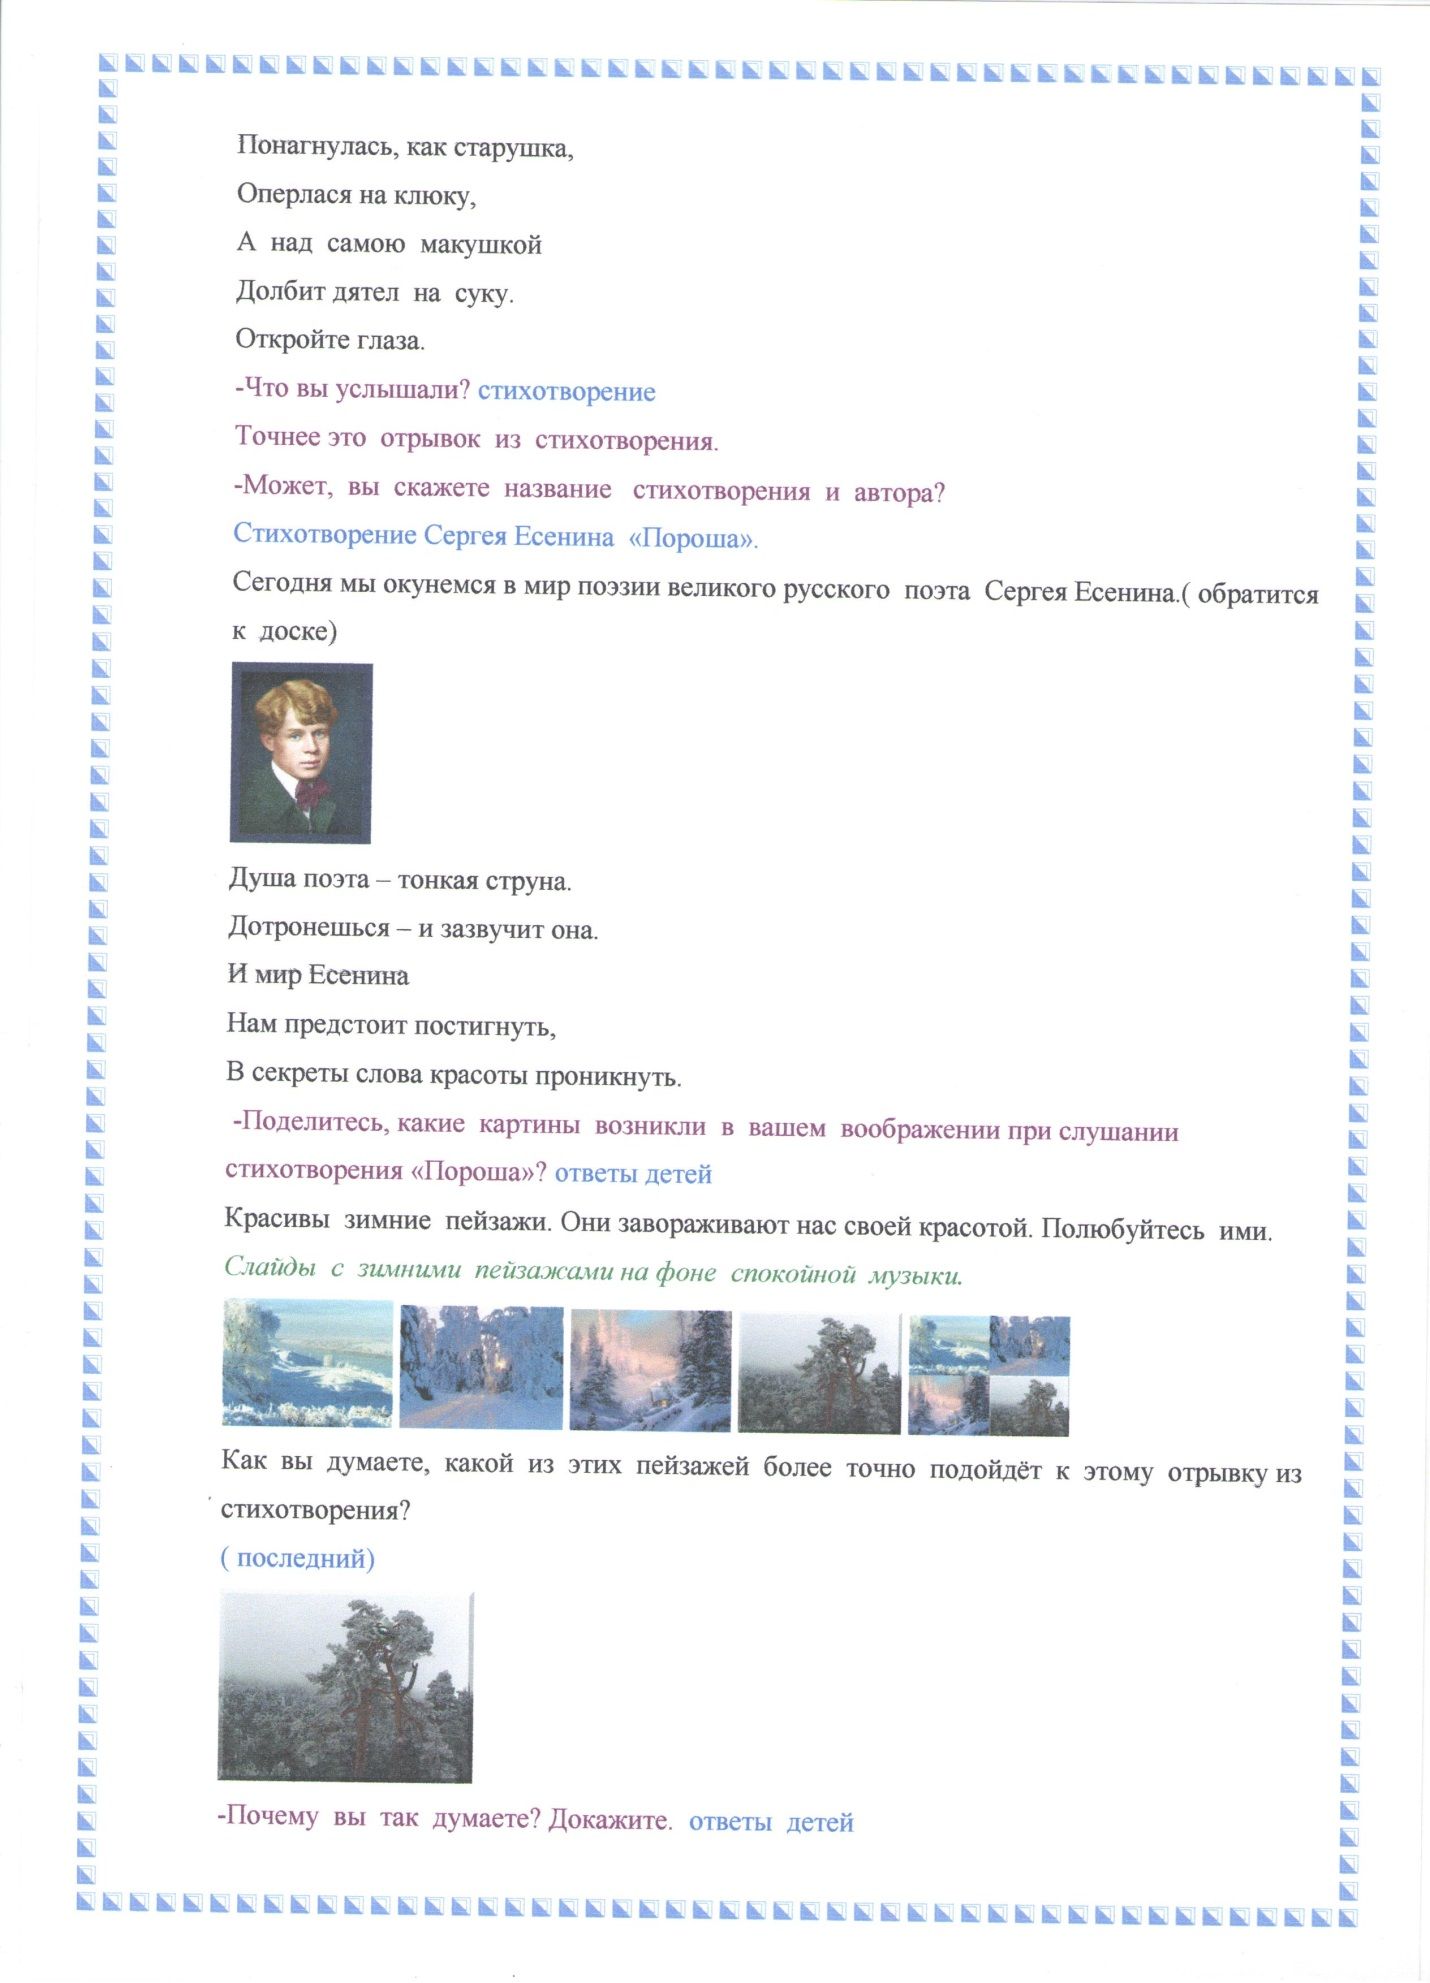 C:\Users\User\Desktop\3Б\2015-10-16 3\3 001.jpg